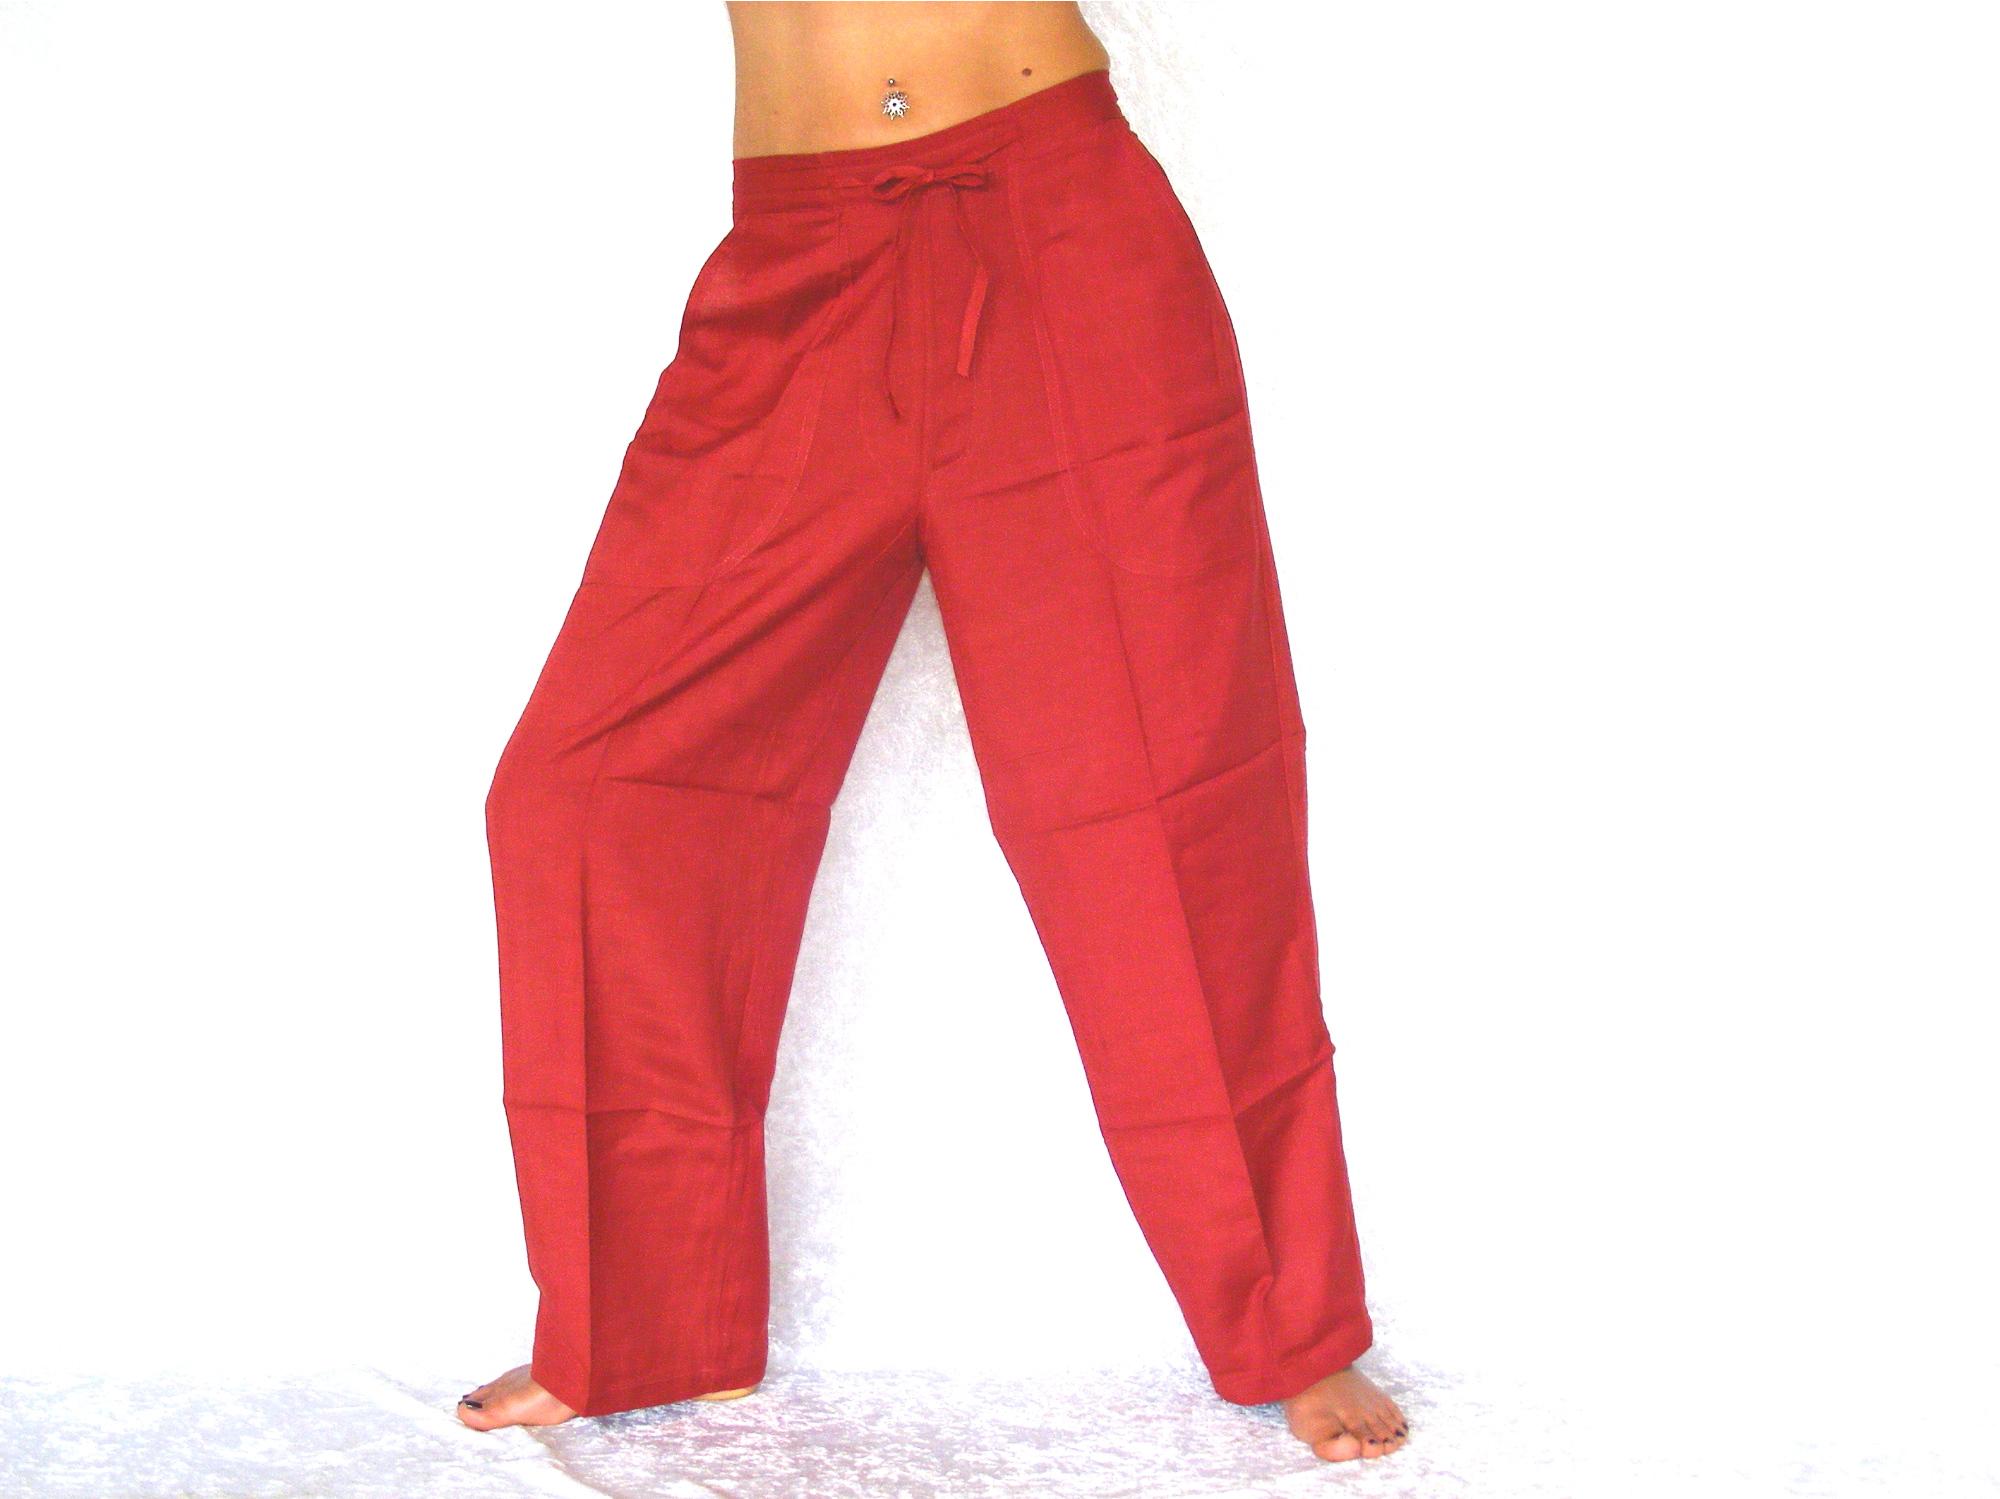 buddha arts more mega bequeme rote yoga freizeit hose aus 100 leinen. Black Bedroom Furniture Sets. Home Design Ideas